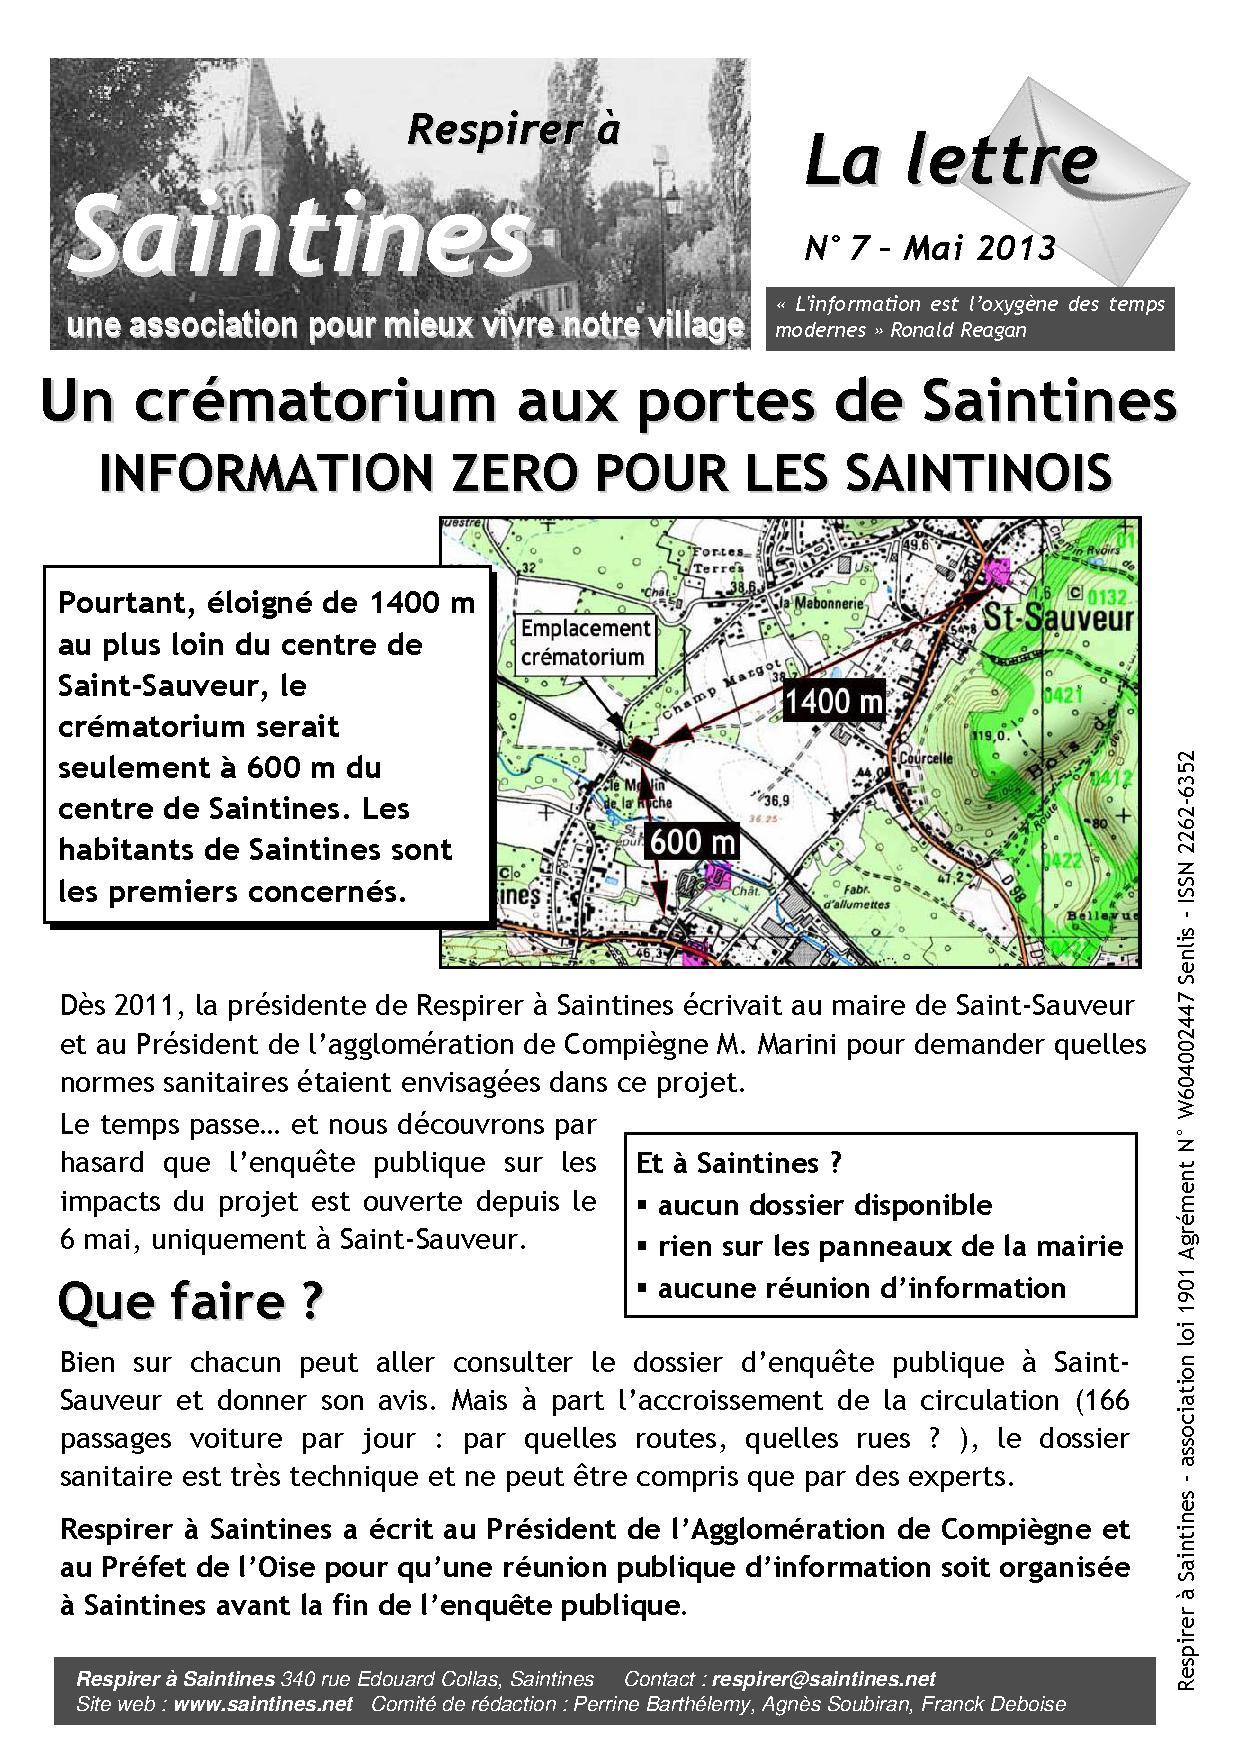 La Lettre de mai 2013, page 1